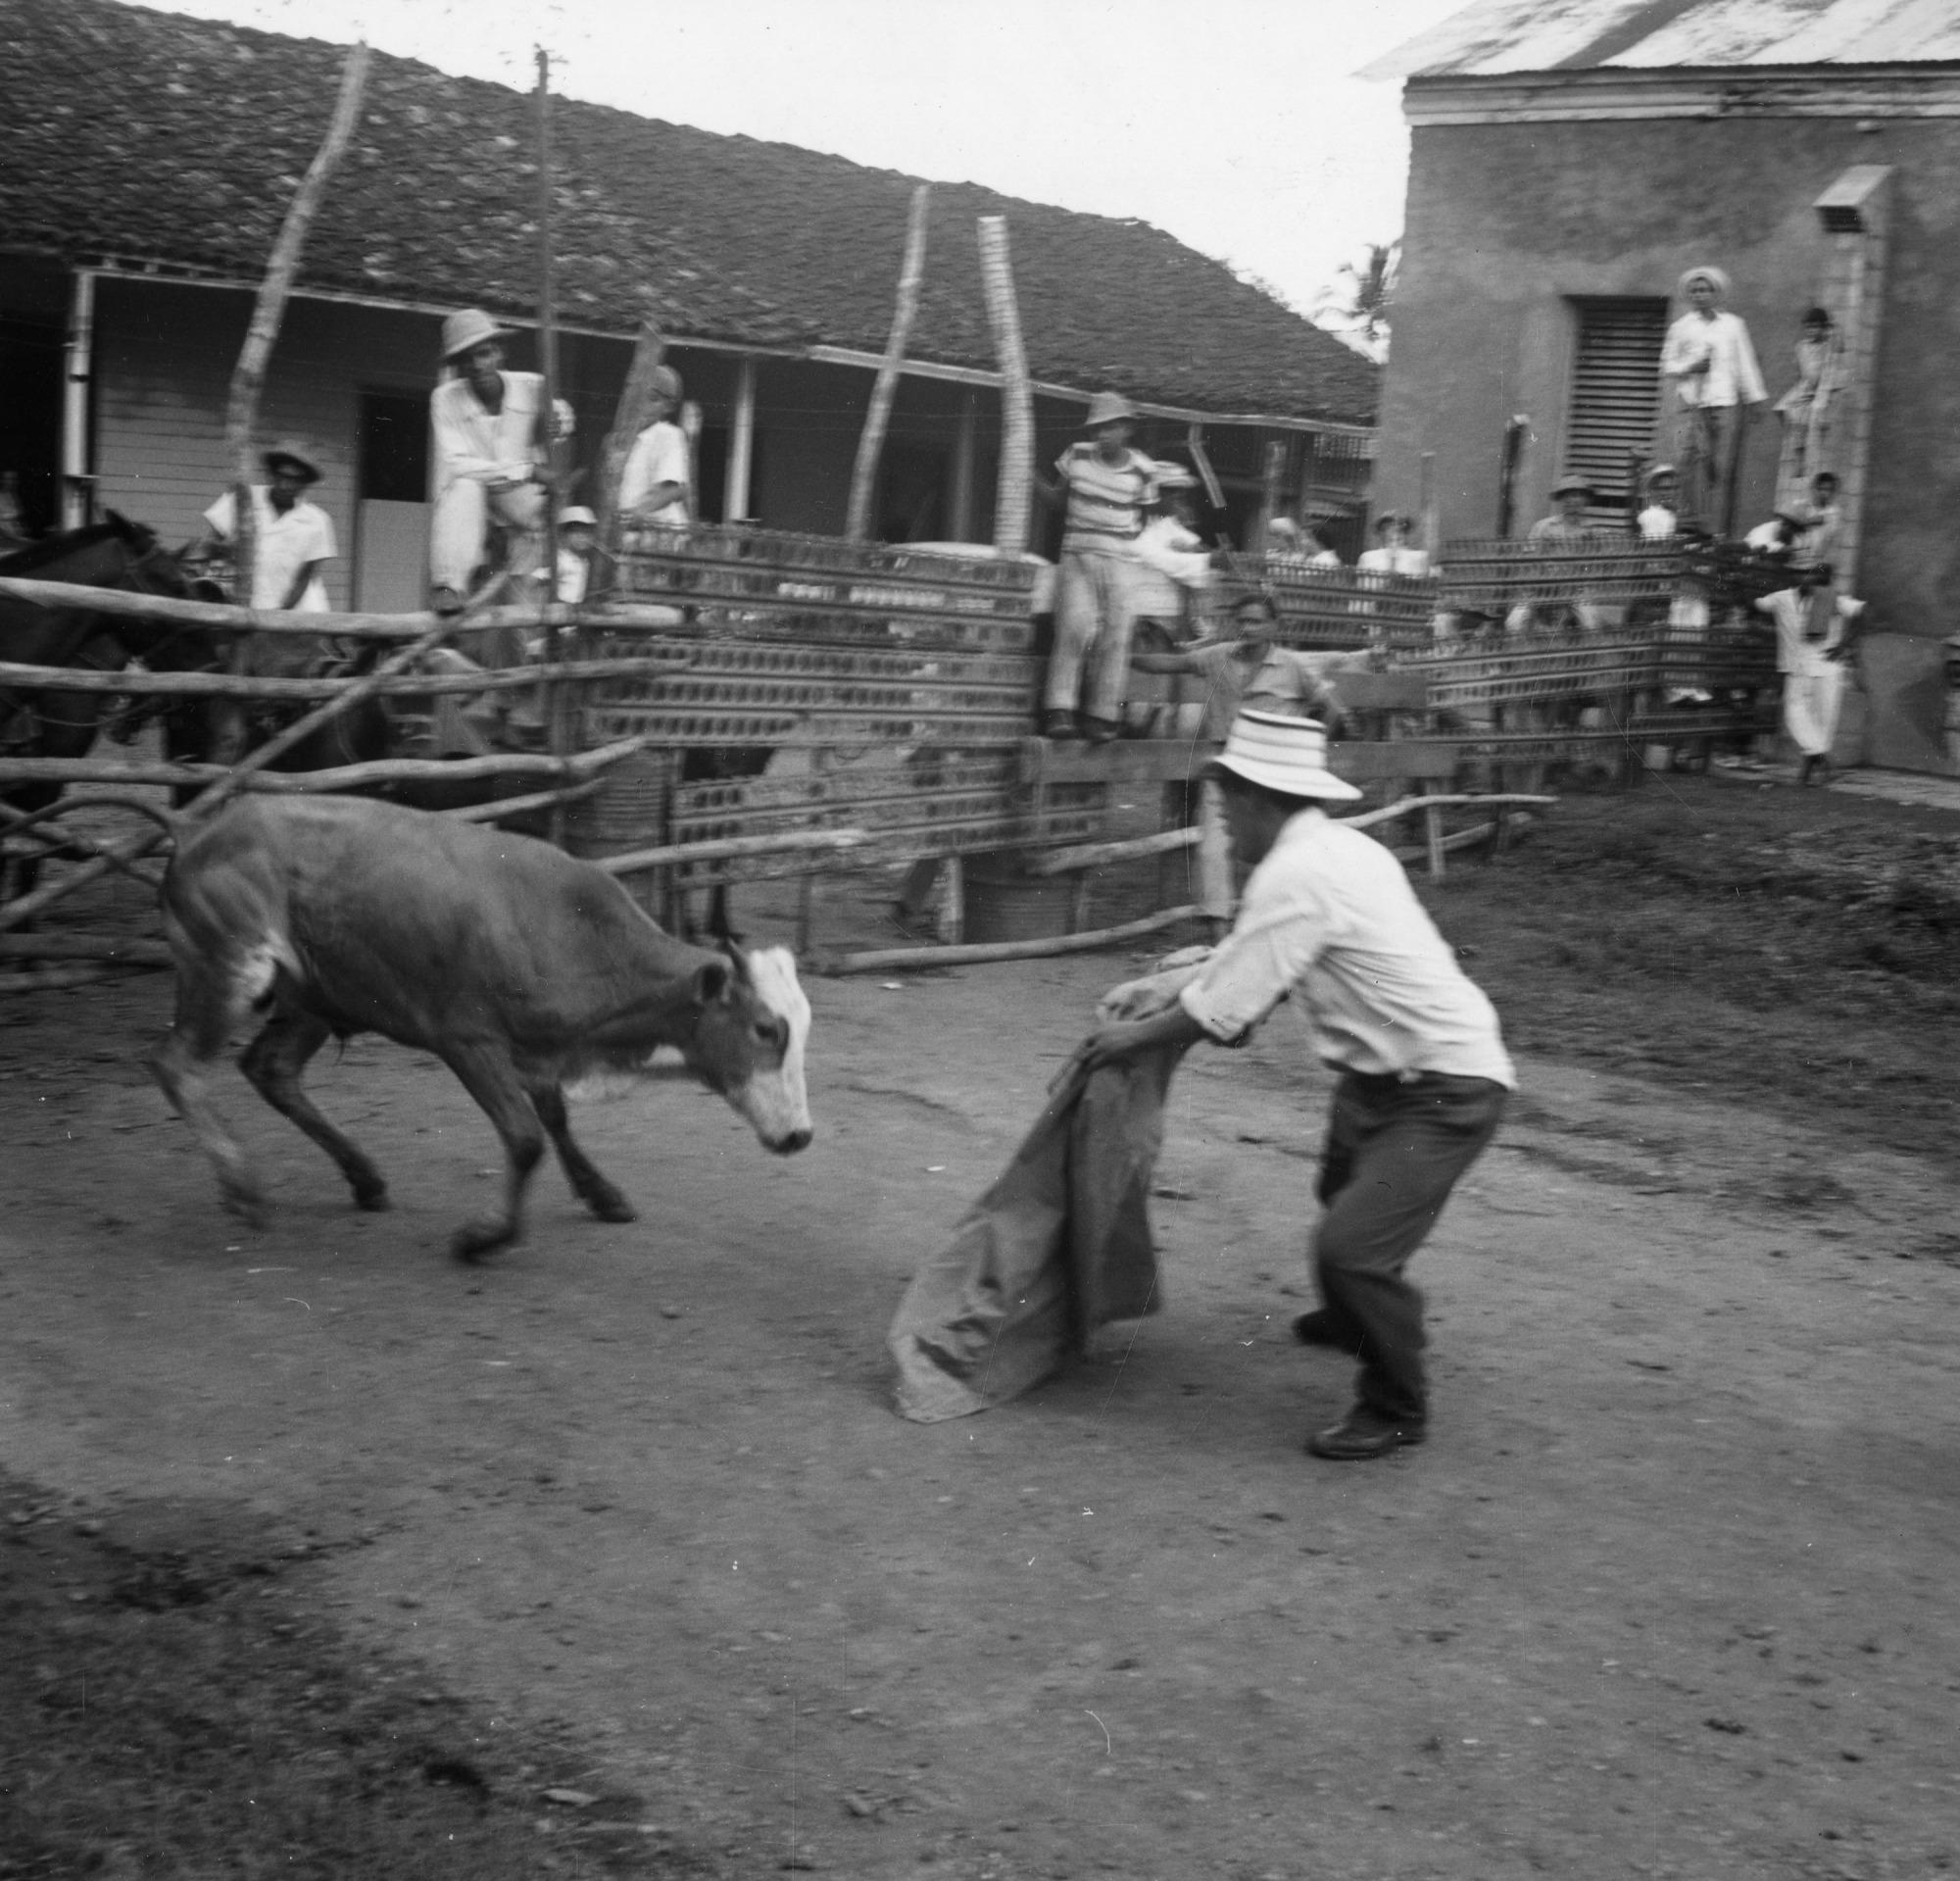 A man fighting a bull in Soná, Veraguas, Panama, 1953